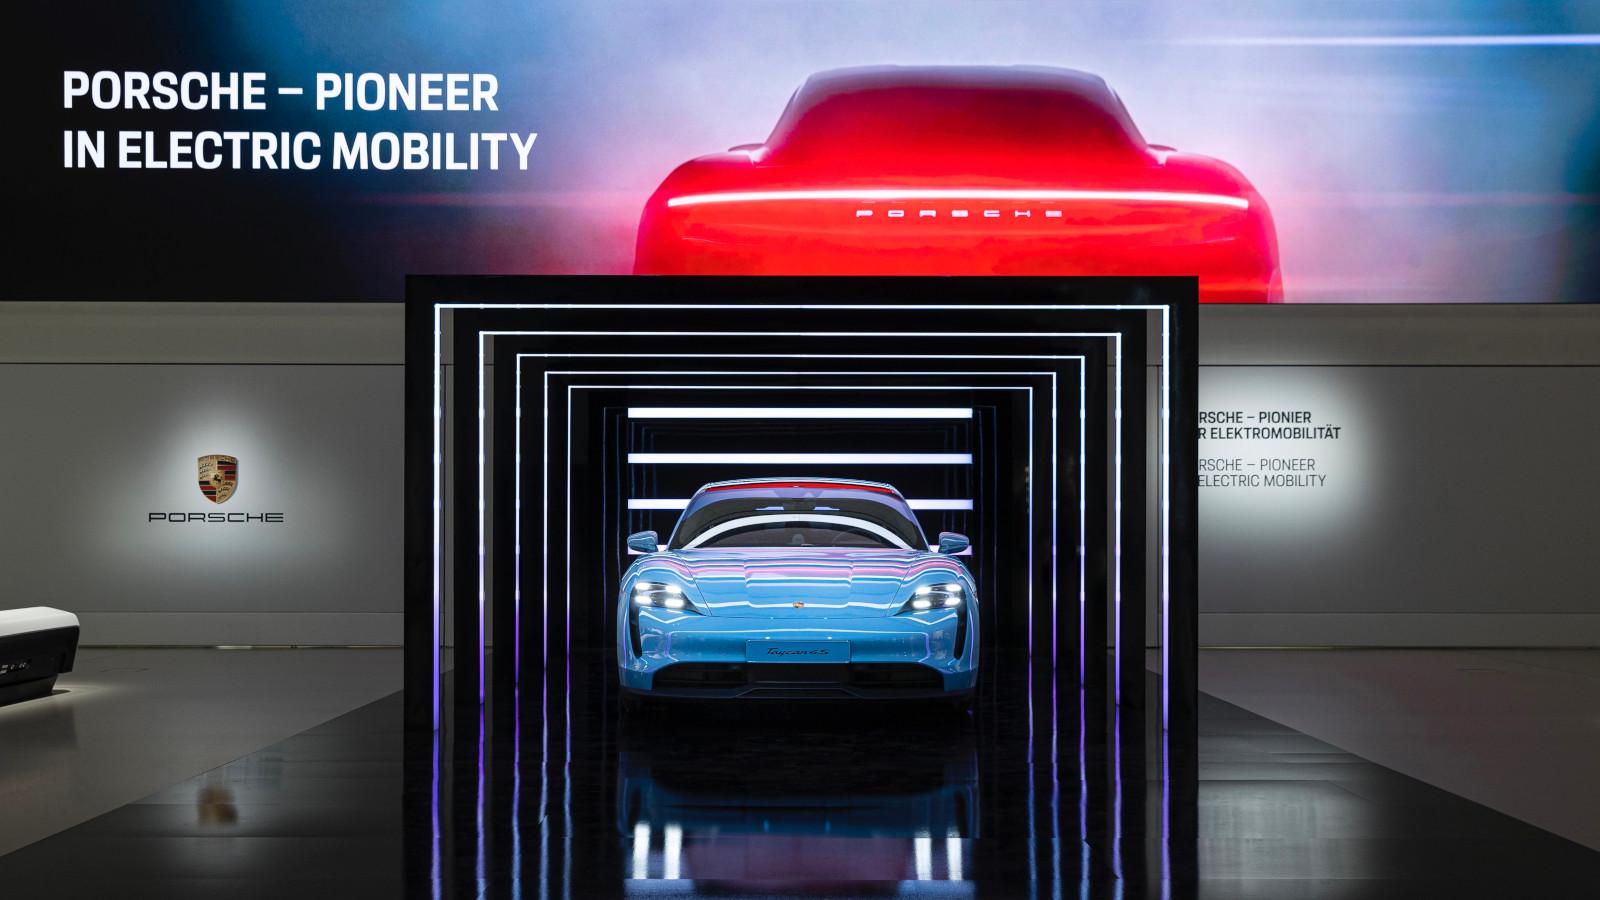 Porsche abre exposición de movilidad eléctrica en Berlín